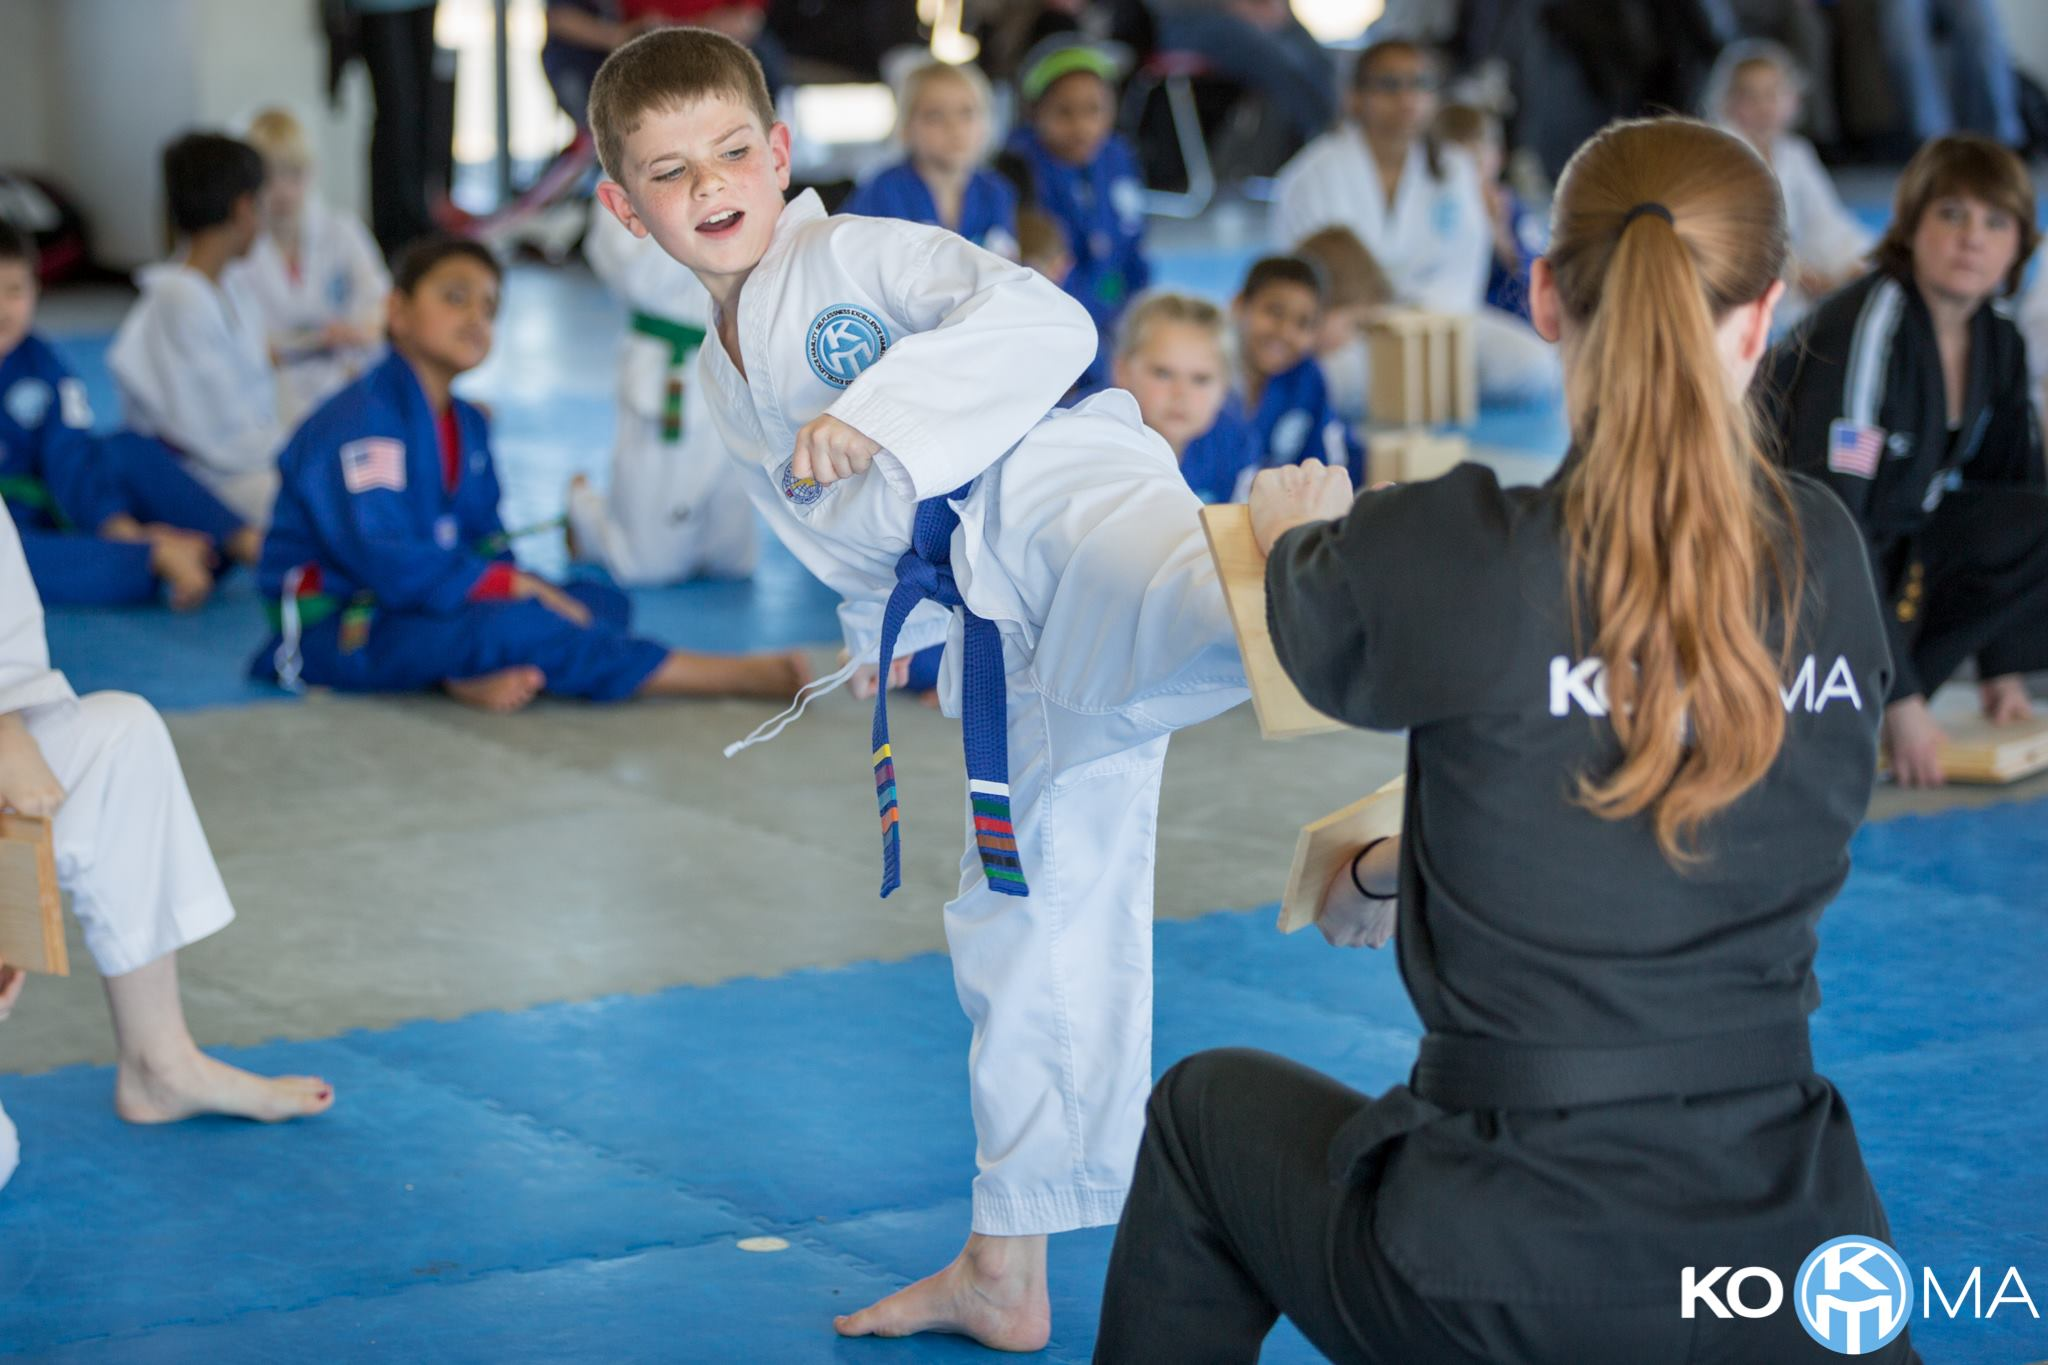 taekwondo-boy-breaking-board.jpg